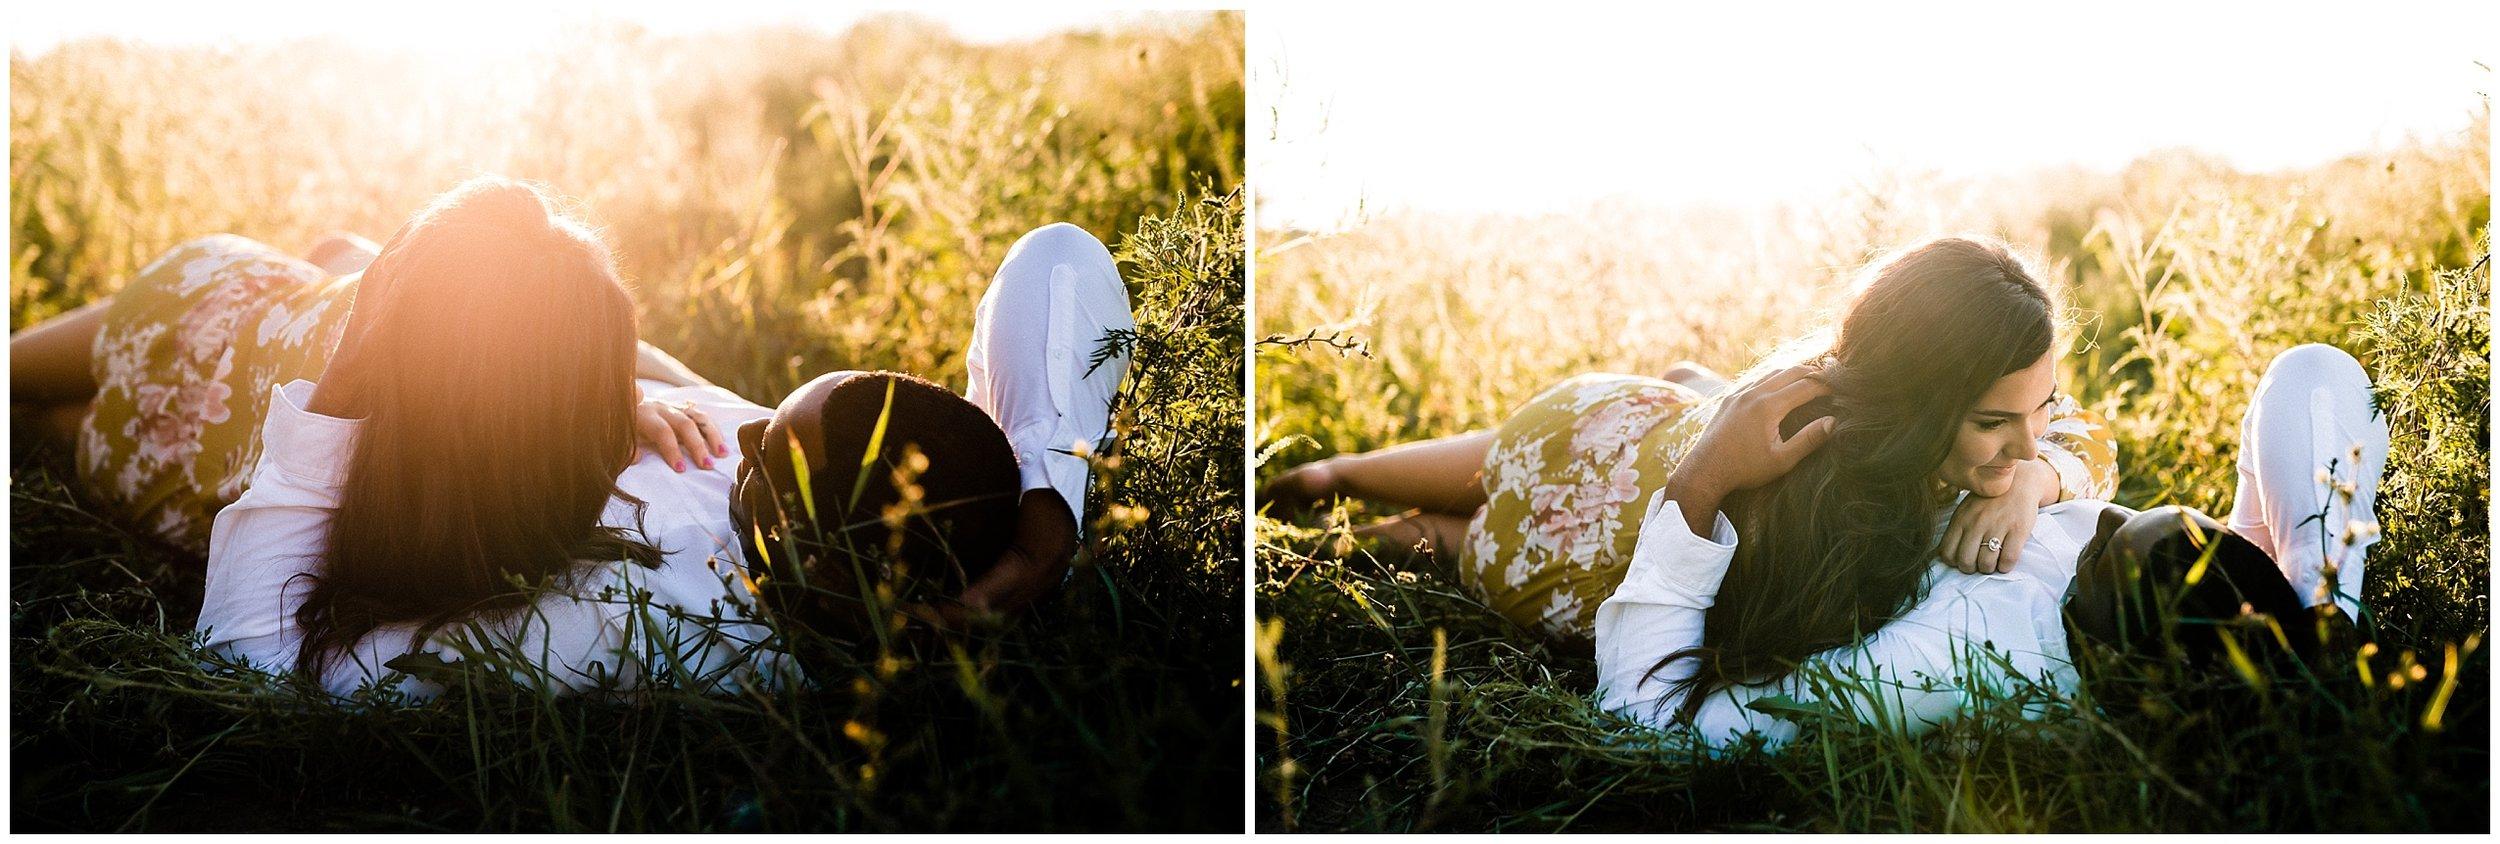 Tabias + Zabrea | Engaged  #kyleepaigephotography_0663.jpg